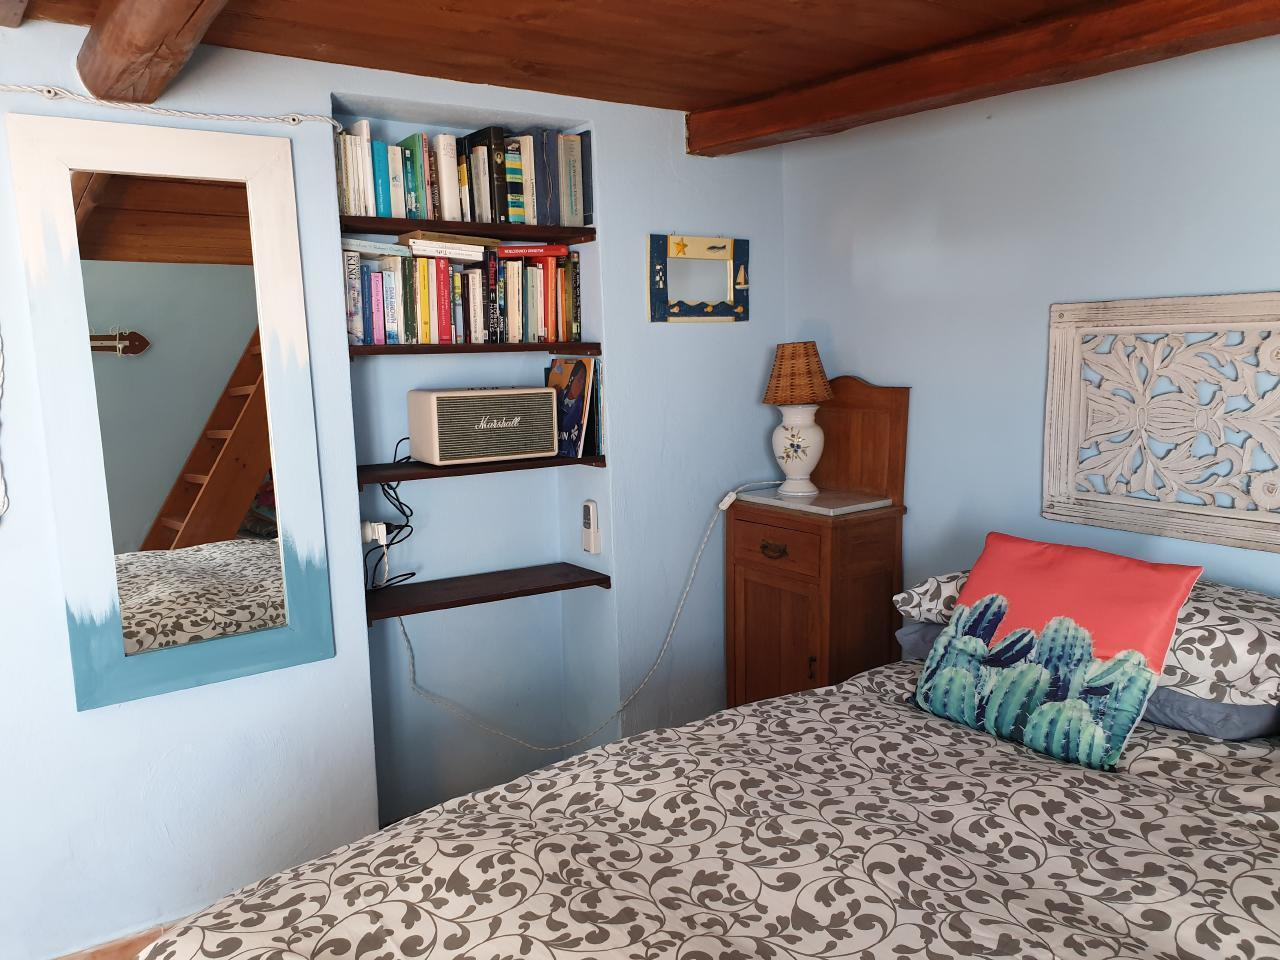 Maison de vacances Casetta Eoliana Lipari Inseln, pool, sauna. (827872), Lipari, Lipari, Sicile, Italie, image 24